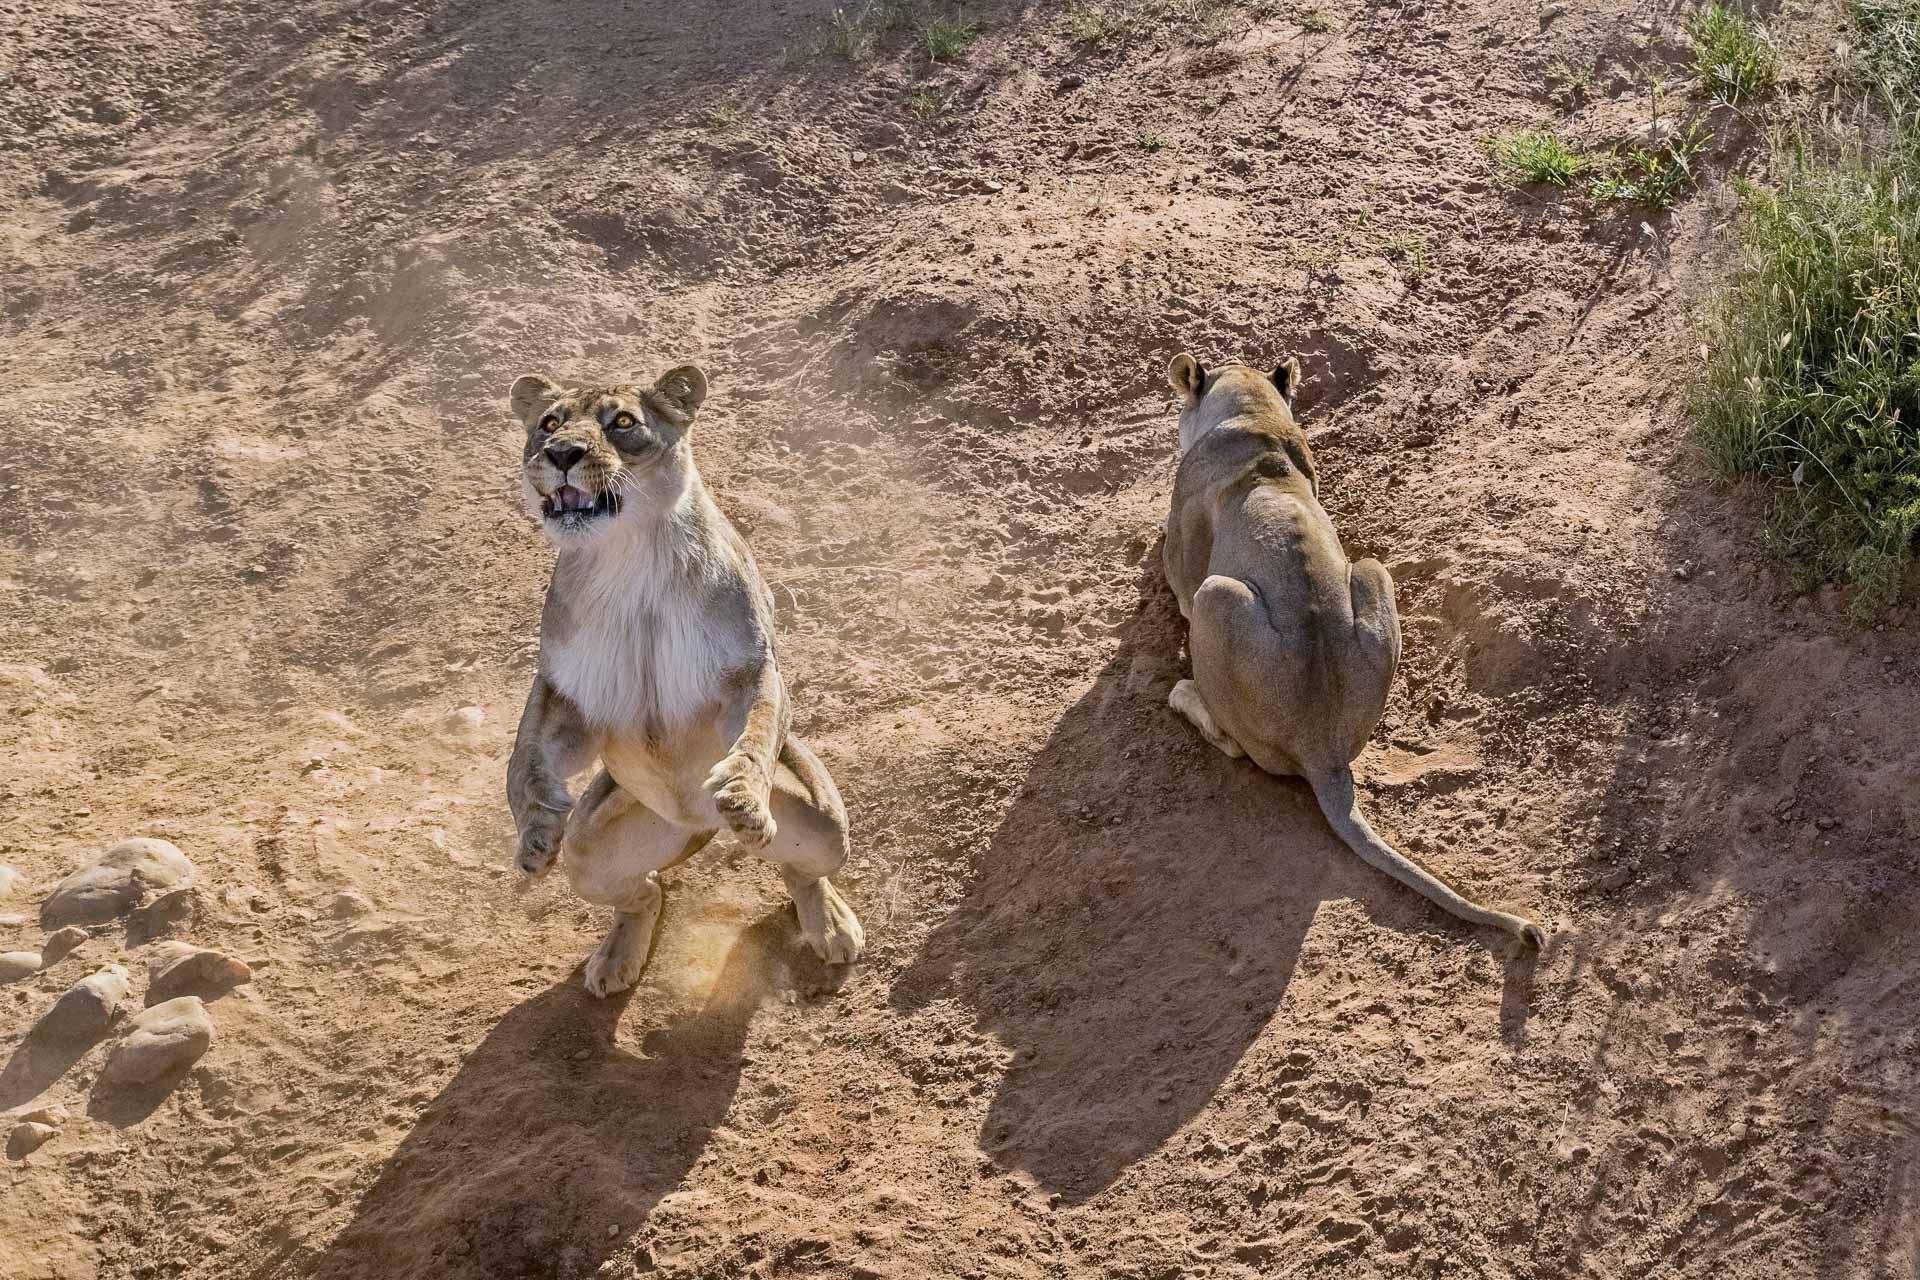 Fotoreise-Fotosafari-hd-2021-087-Namibia